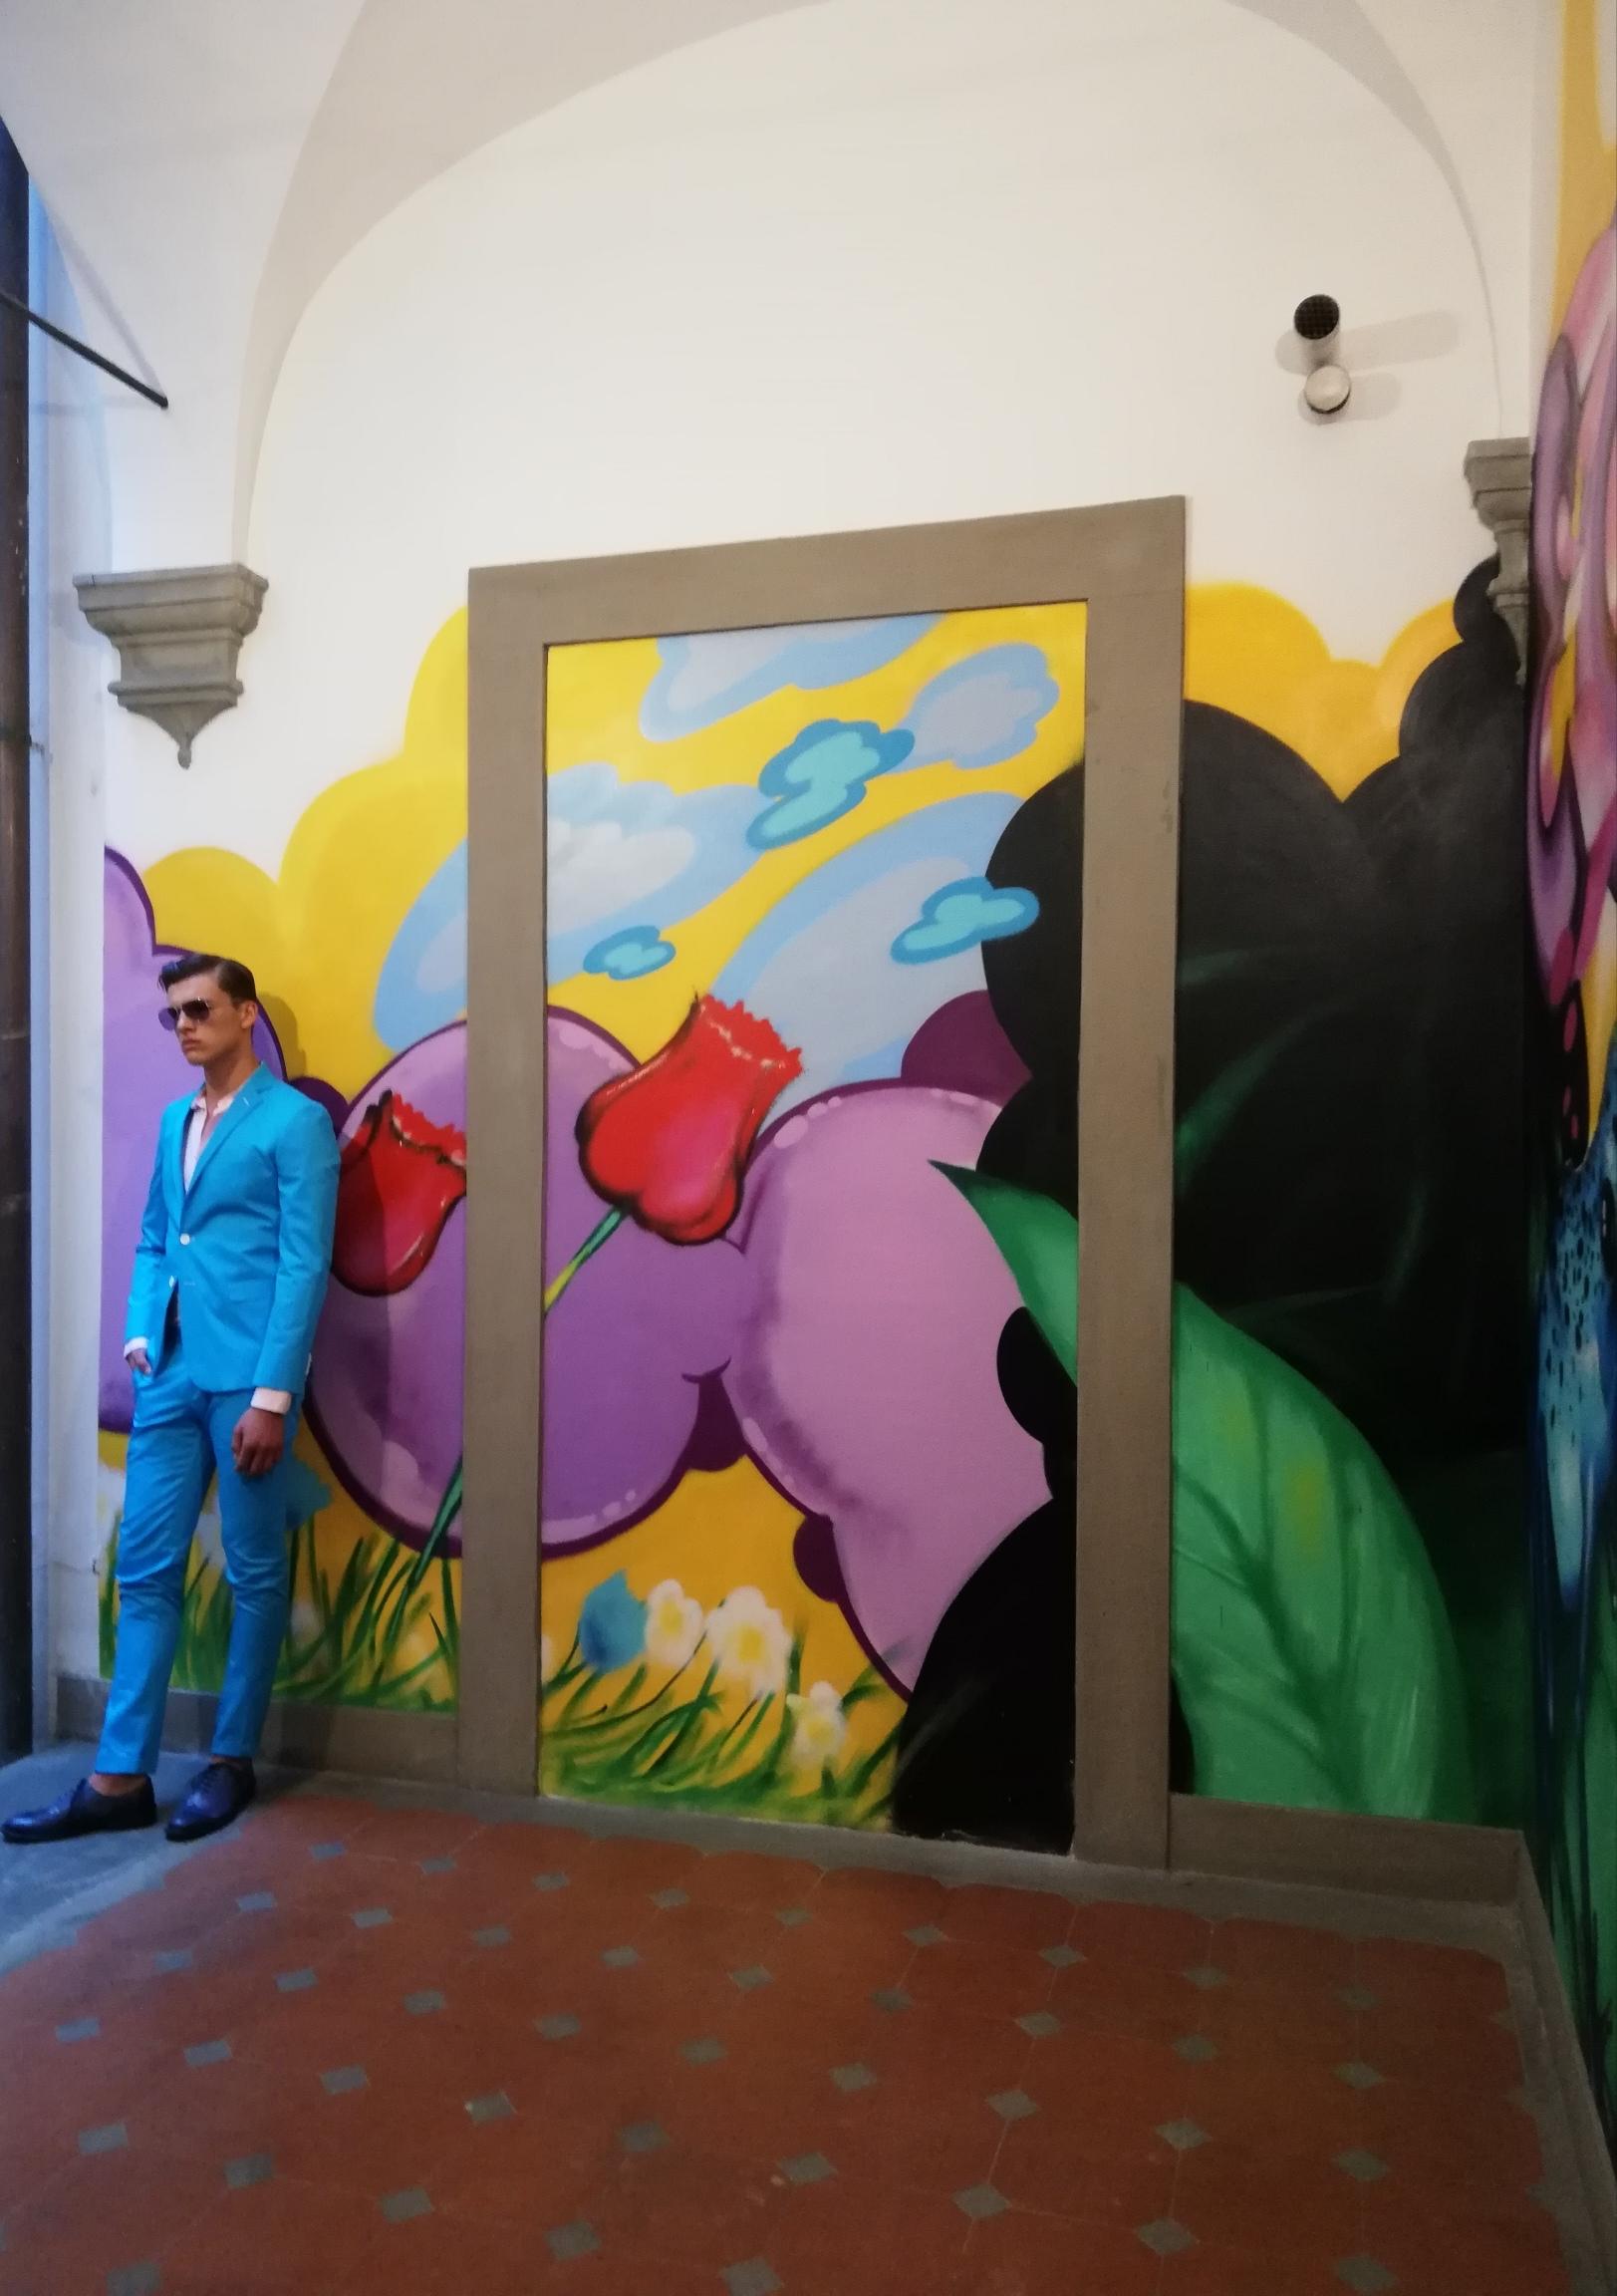 L'opera monumentale di Daze - il murales